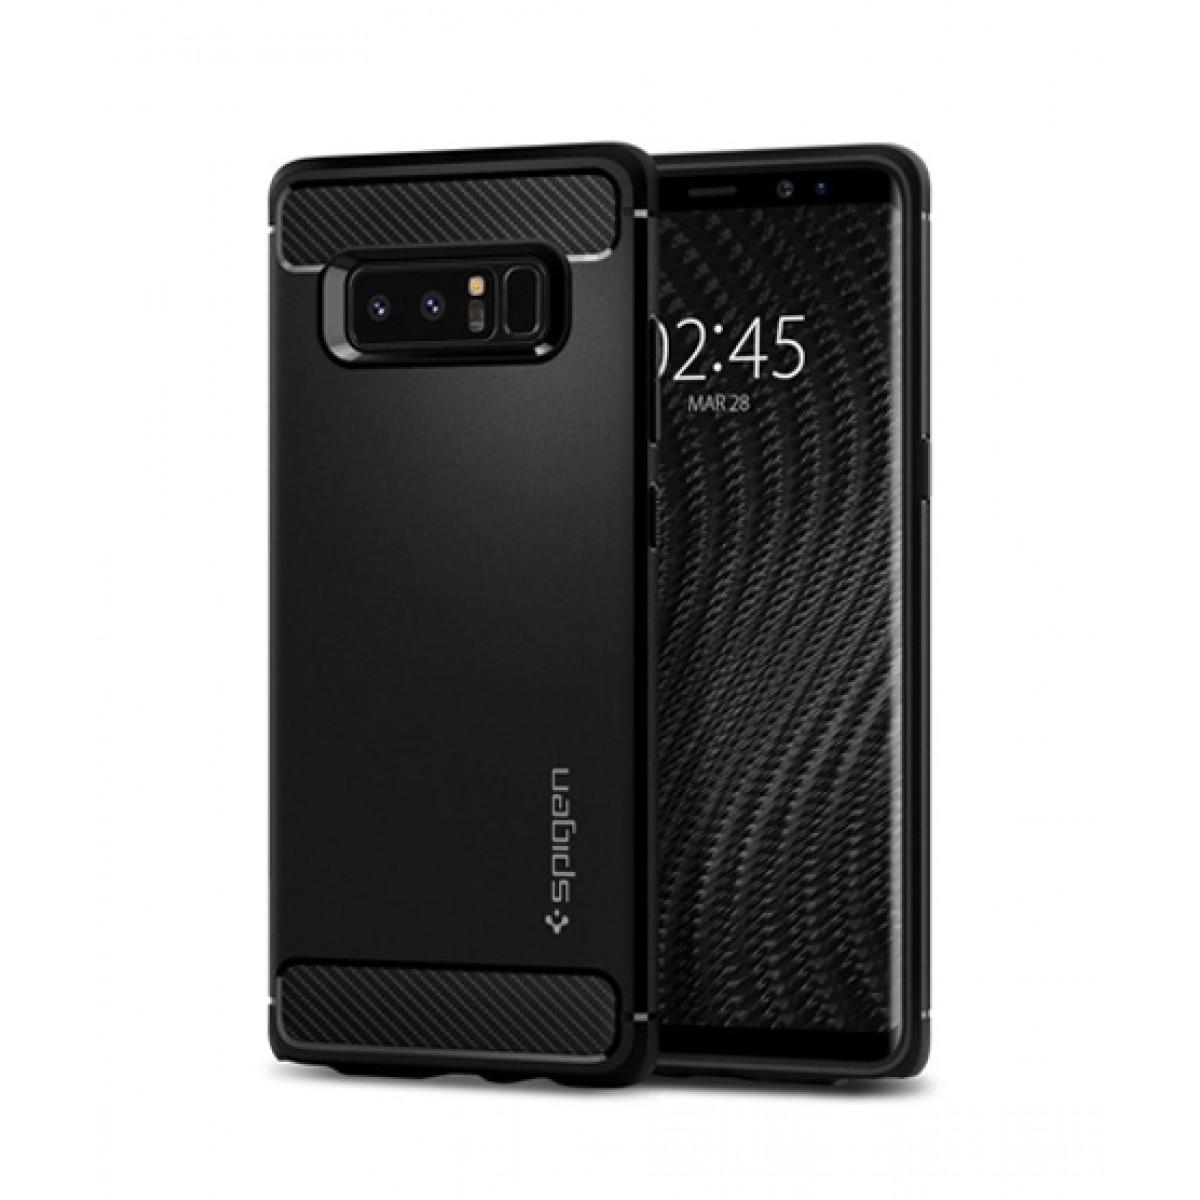 super popular 209f0 f246a Spigen Rugged Armor Matte Black Case For Galaxy Note 8